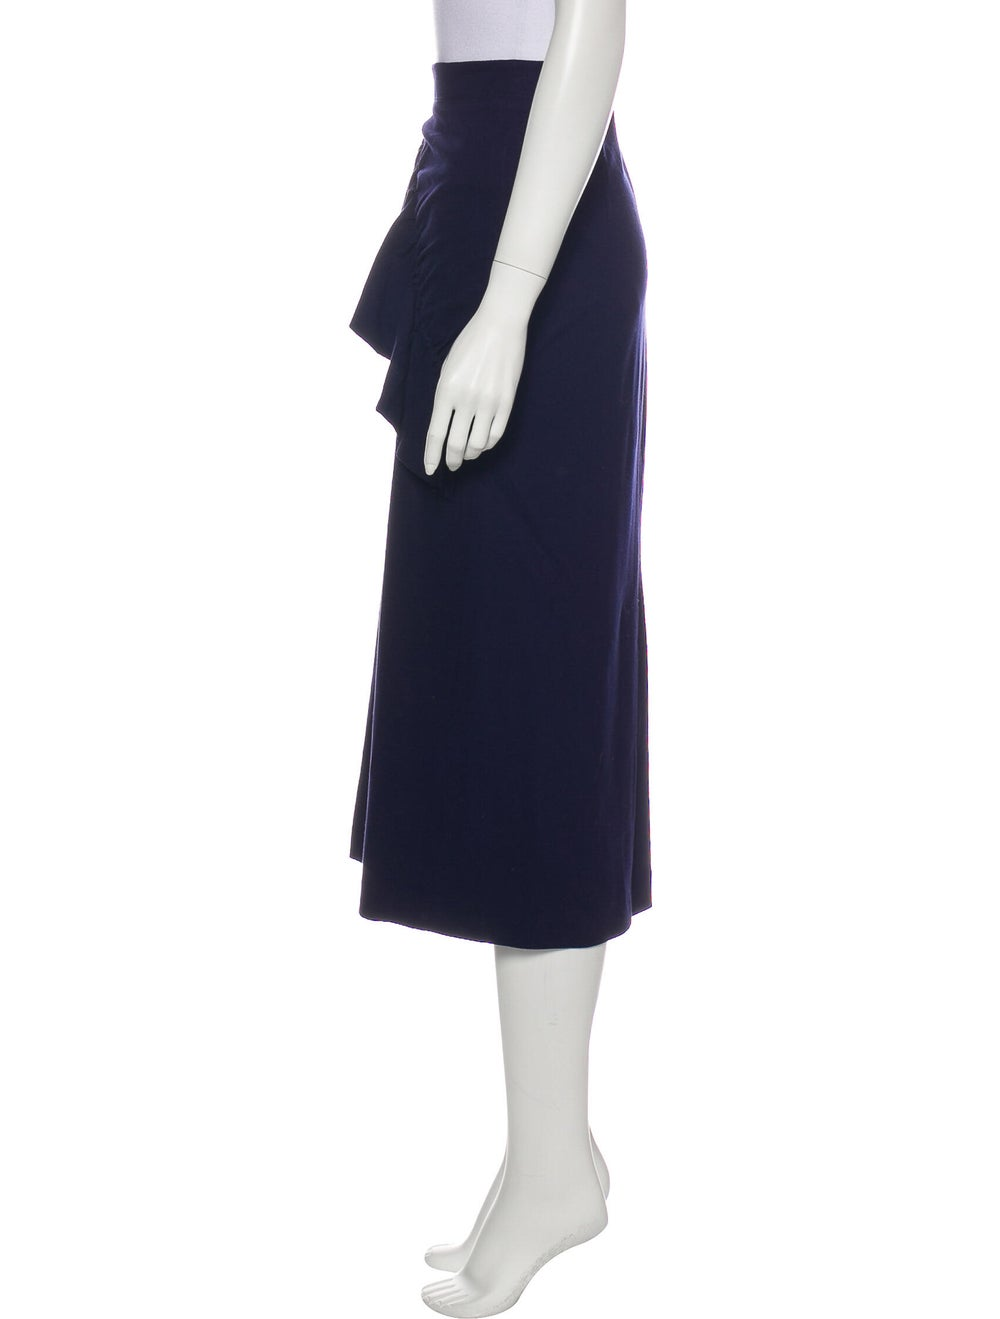 Tibi Ruffle Embellishment Midi Length Skirt Blue - image 2